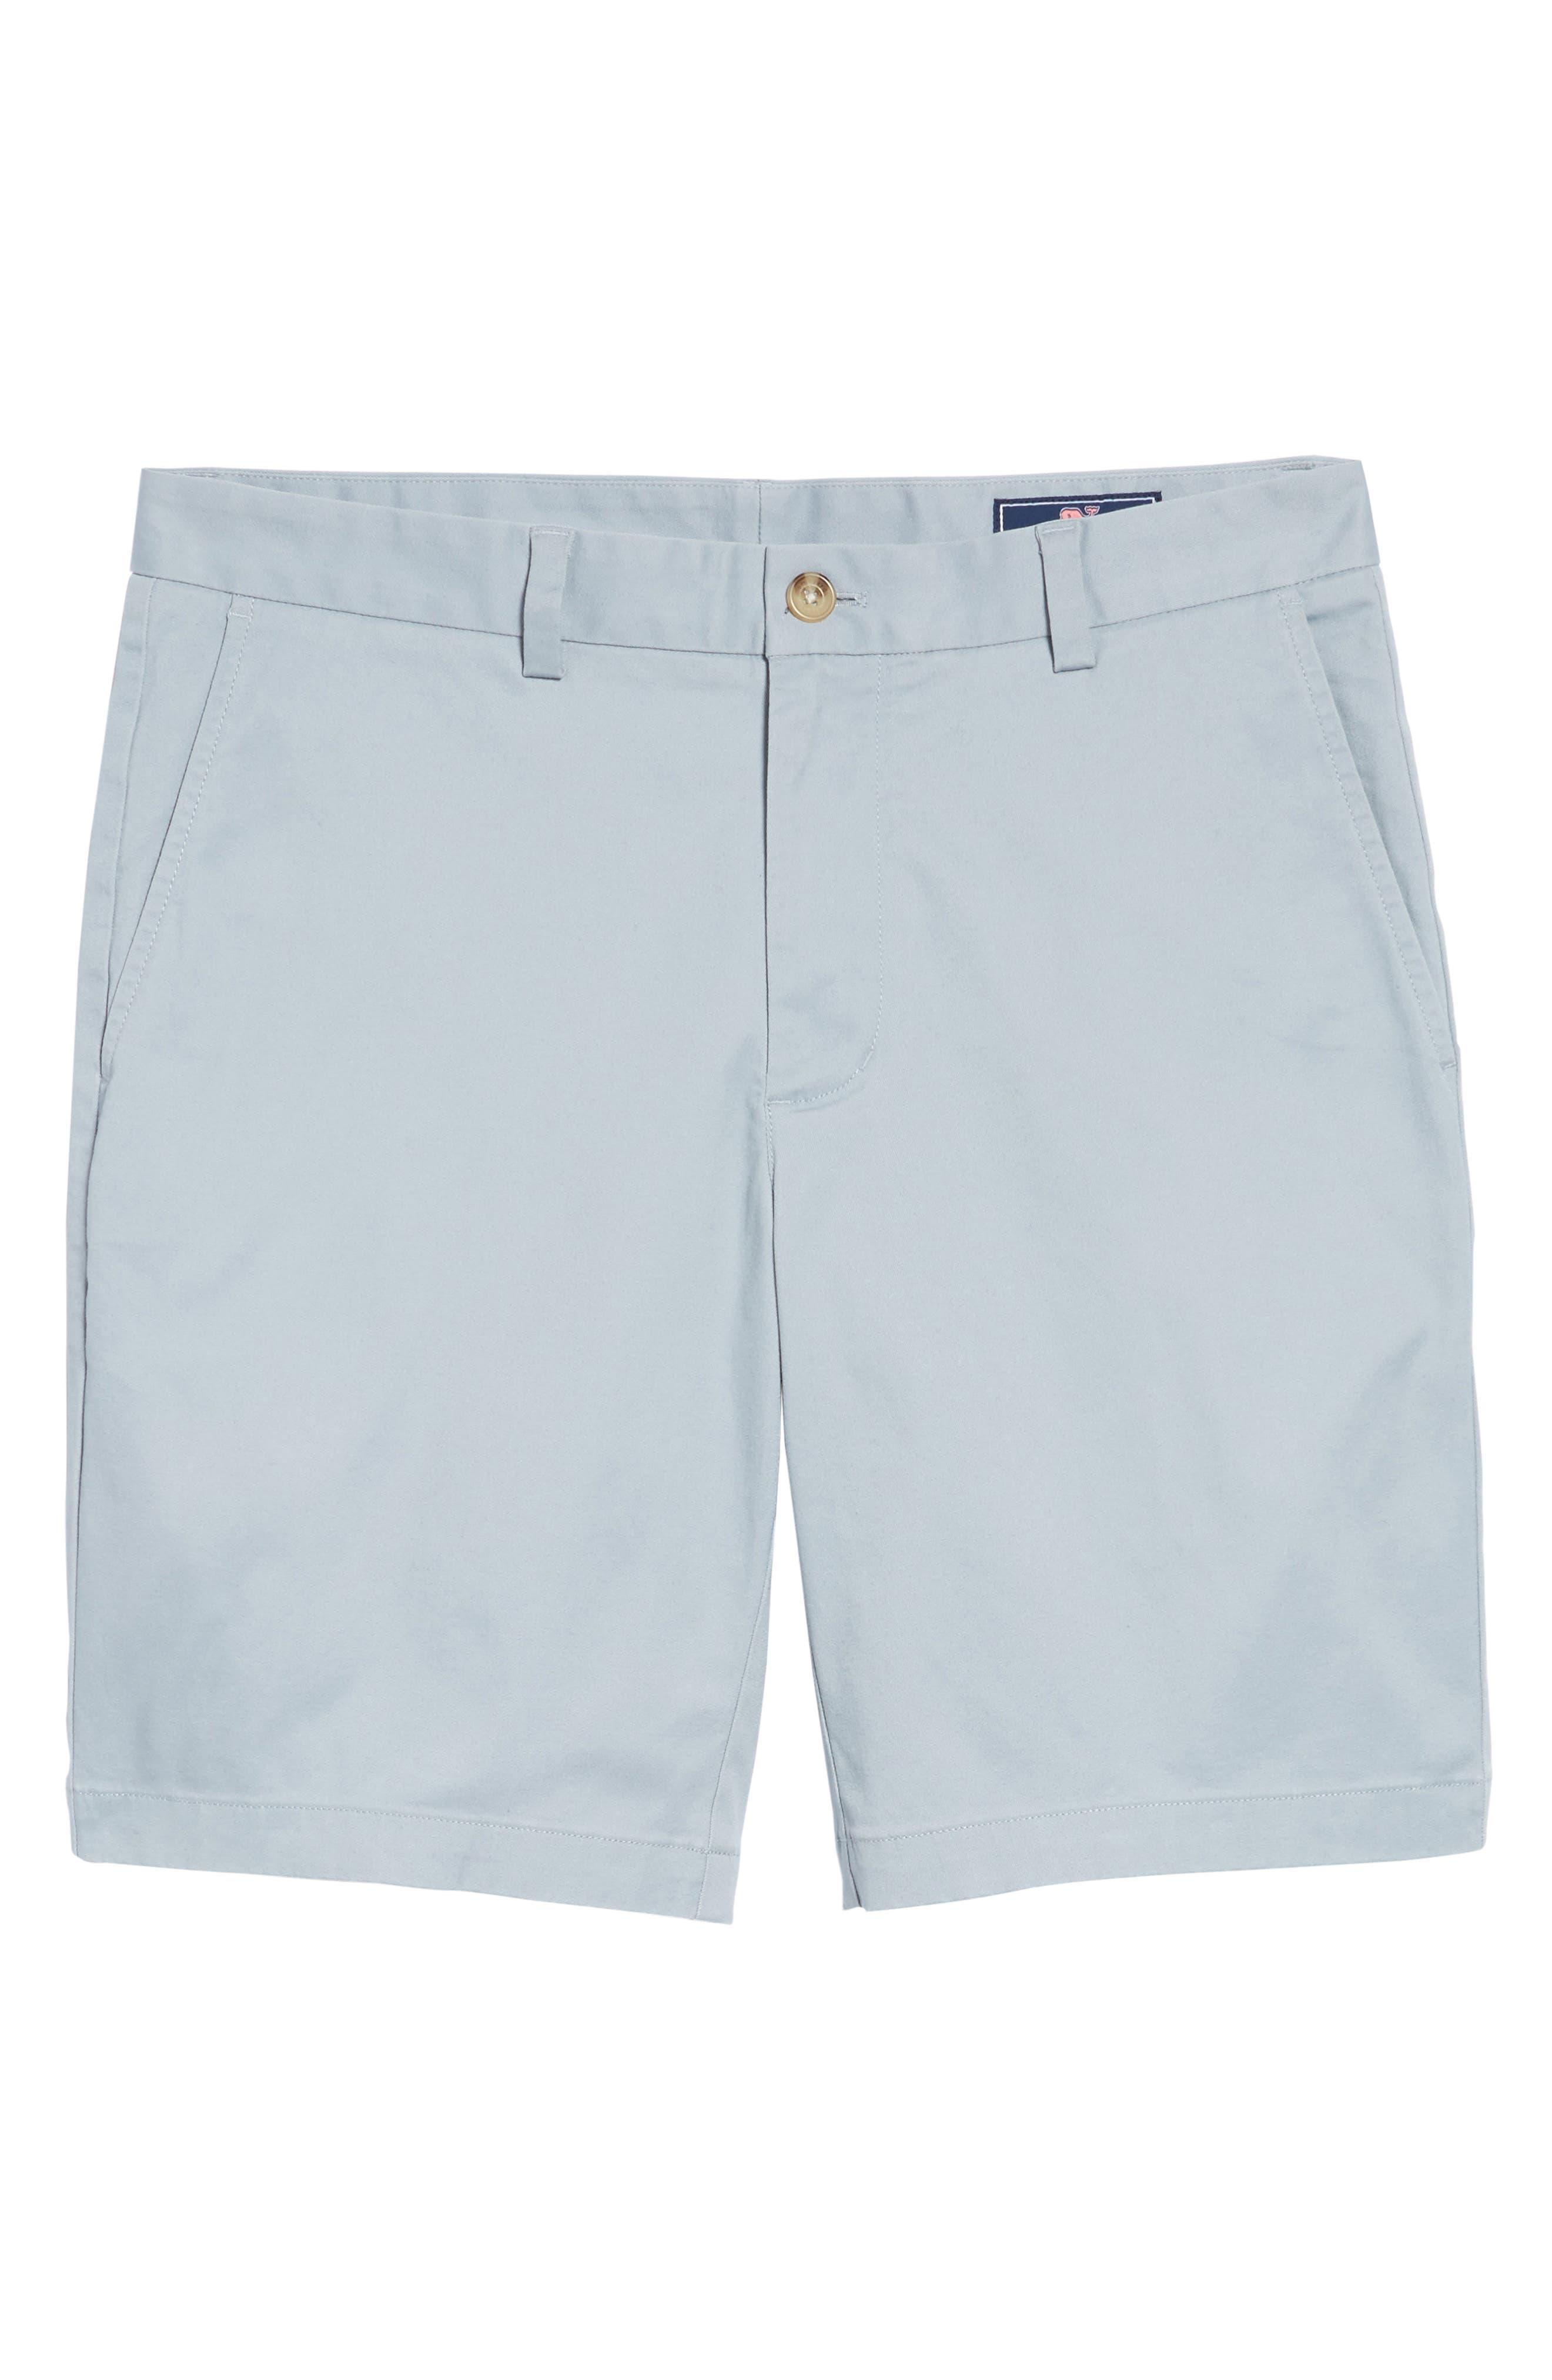 9 Inch Stretch Breaker Shorts,                             Alternate thumbnail 6, color,                             034